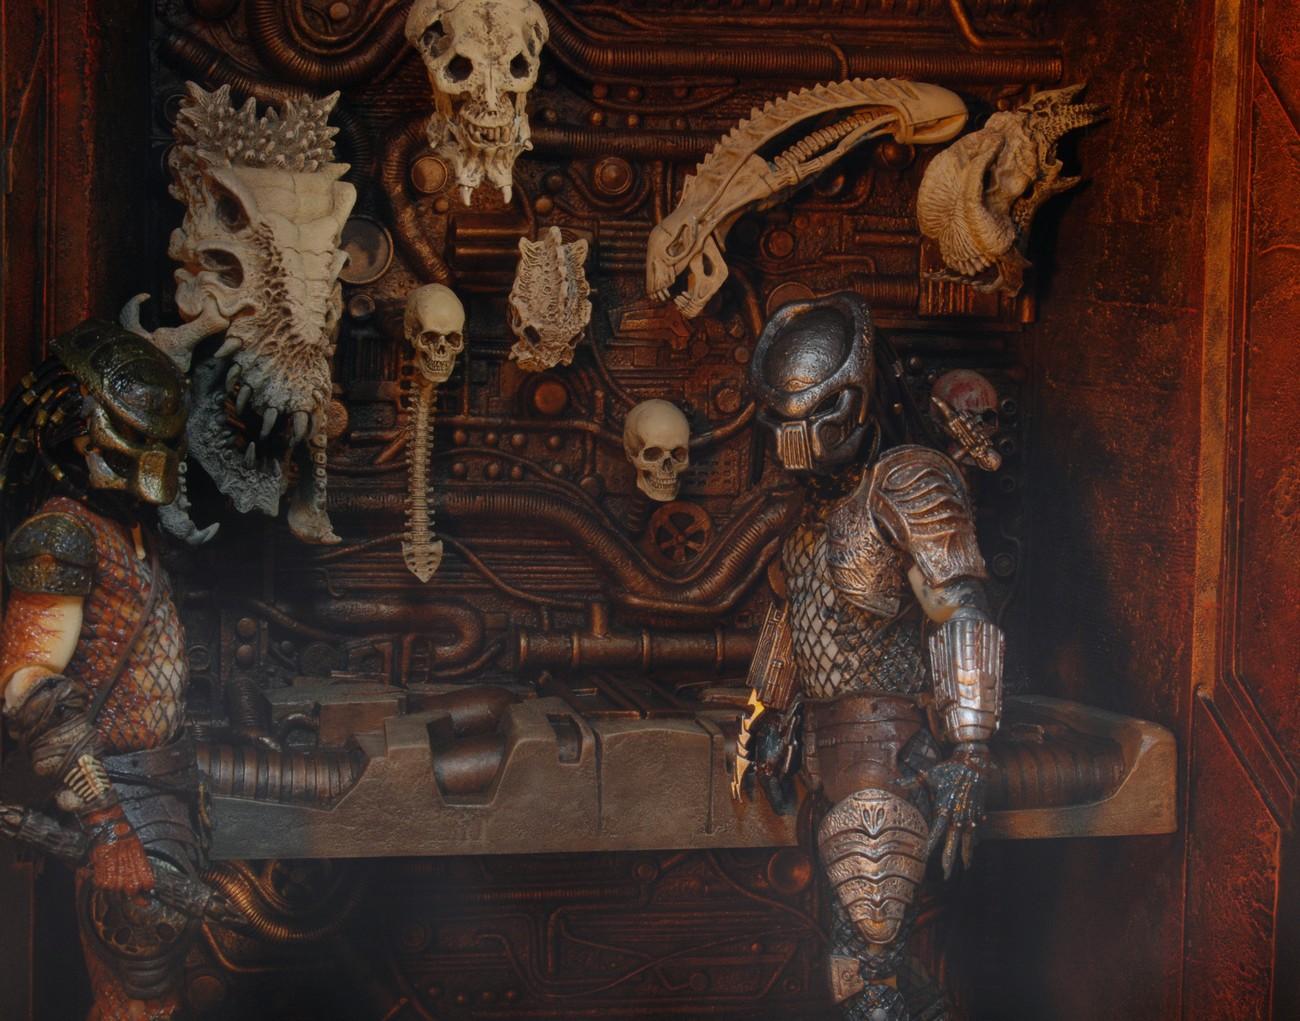 Predators 11 215 12 Trophy Wall Diorama Discontinued